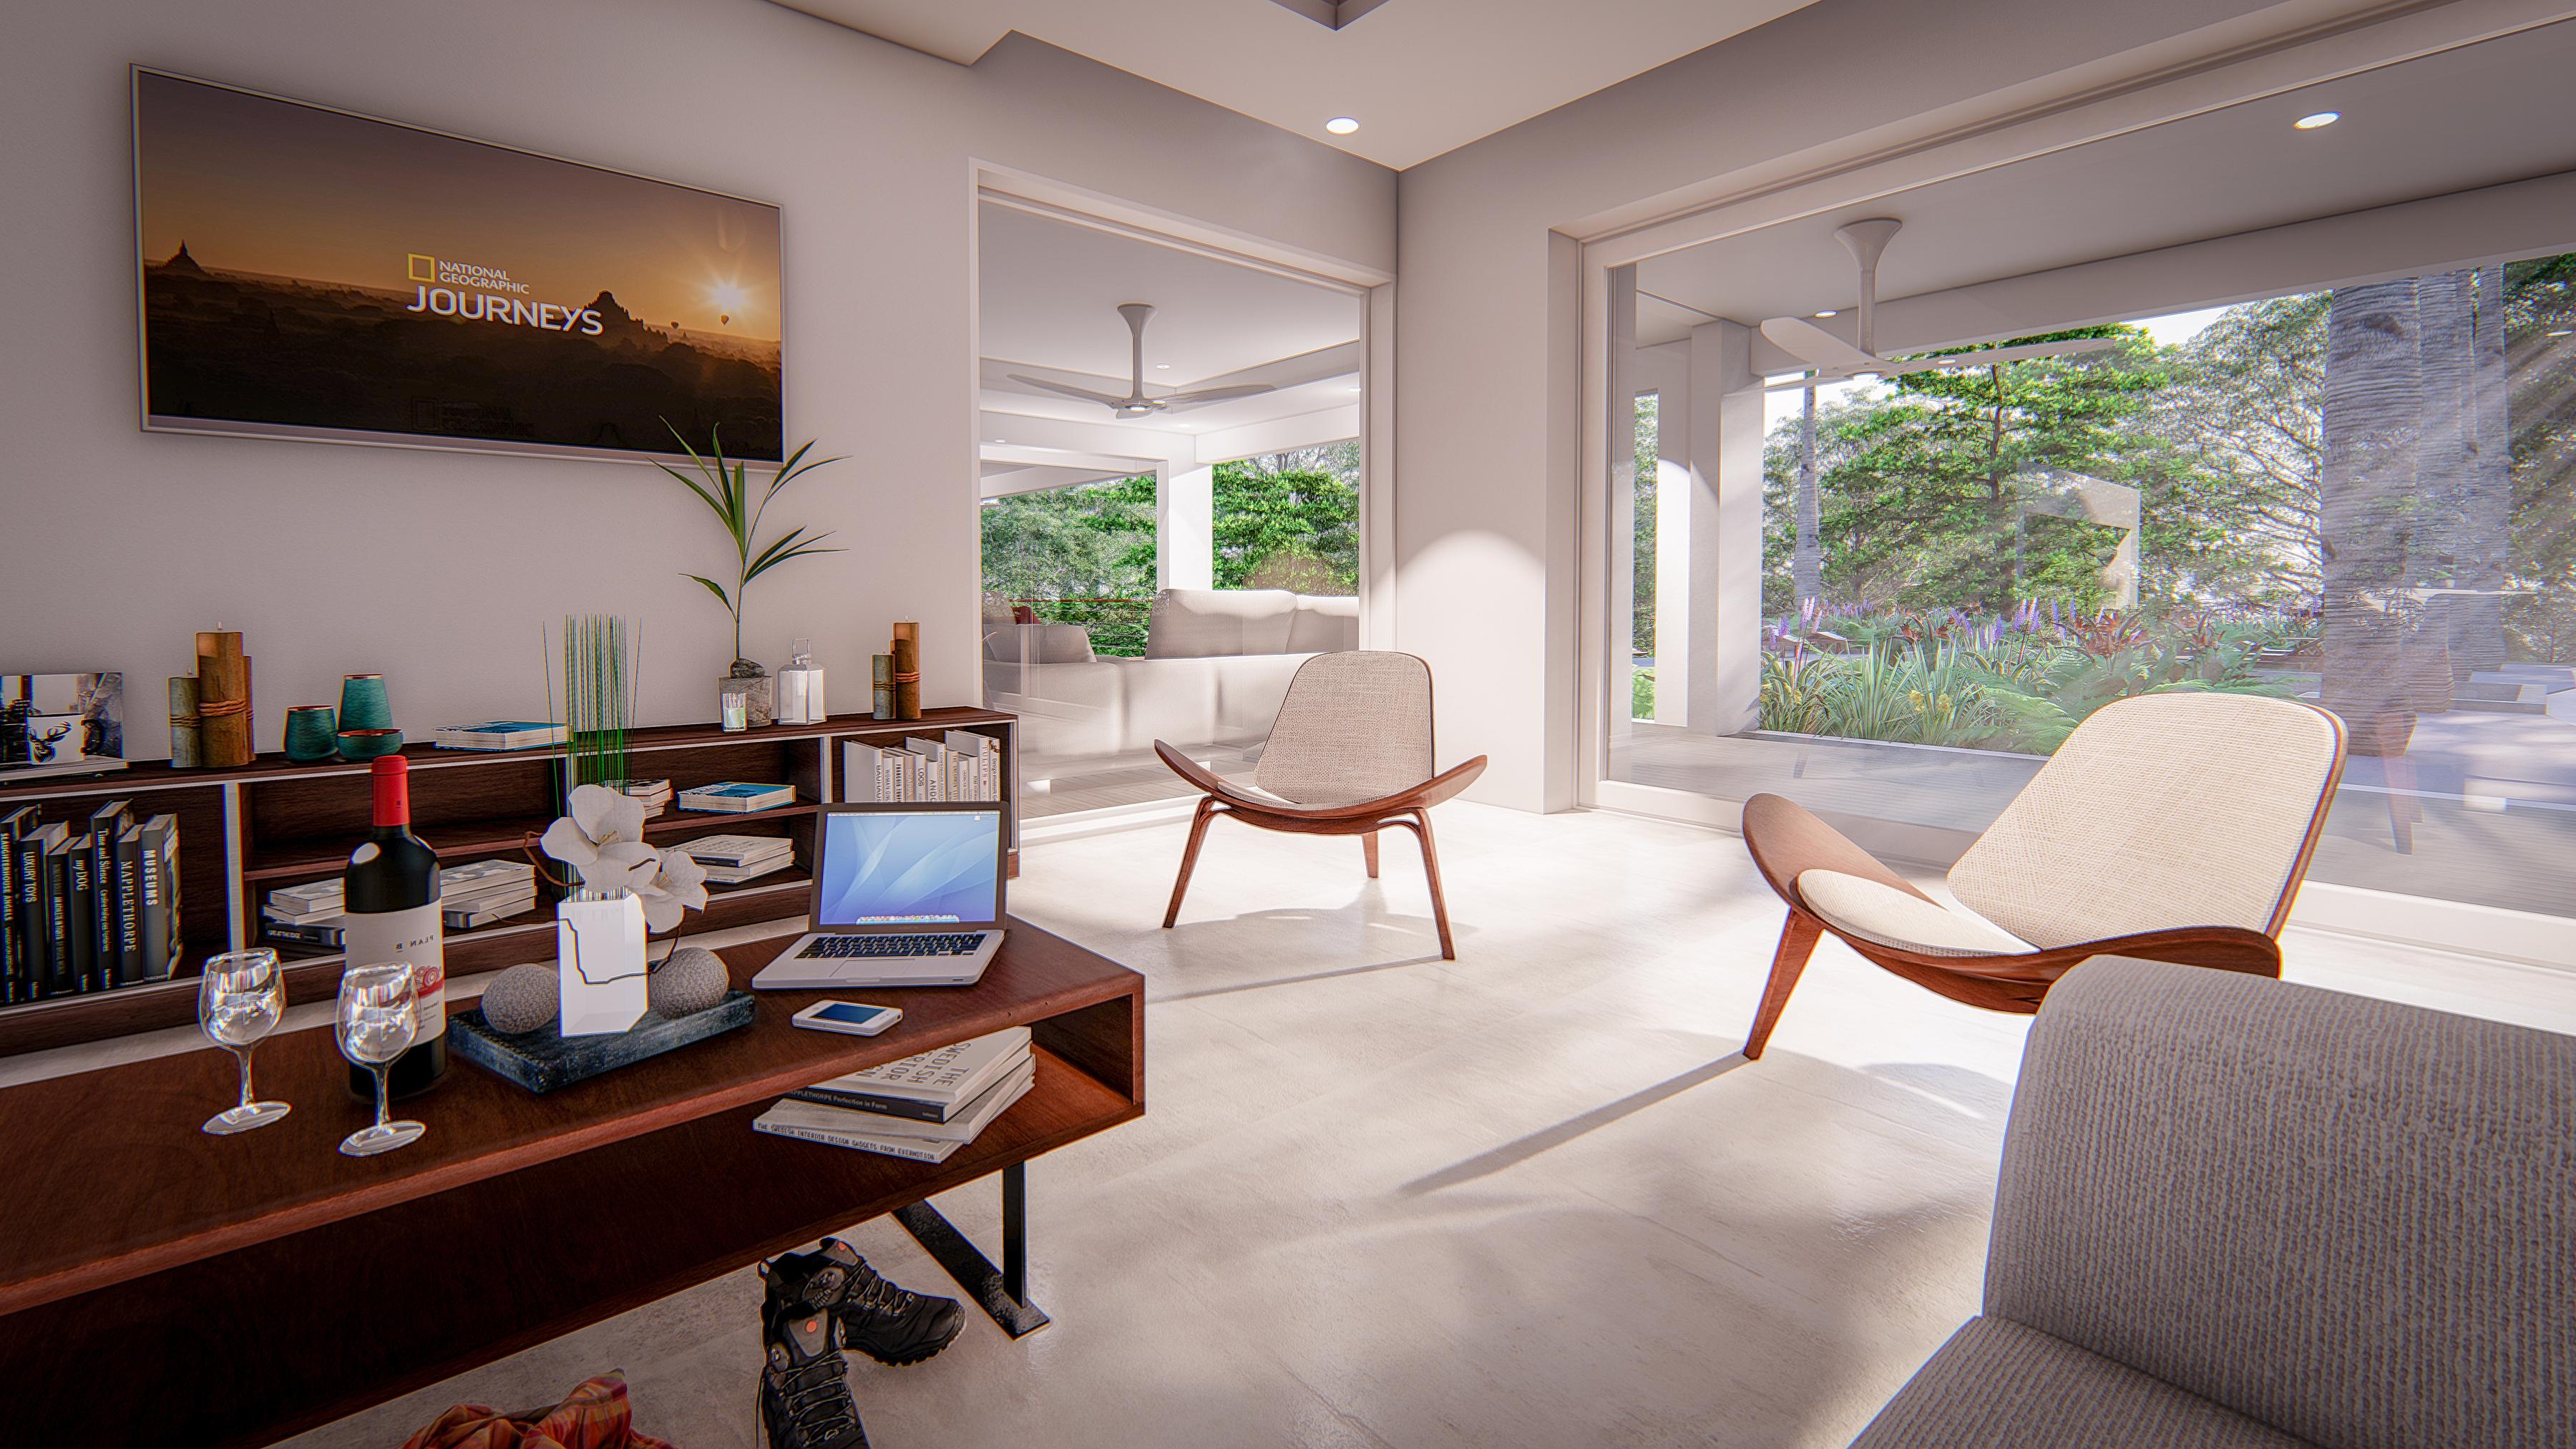 house dulce pacifico development for sale home costa rica